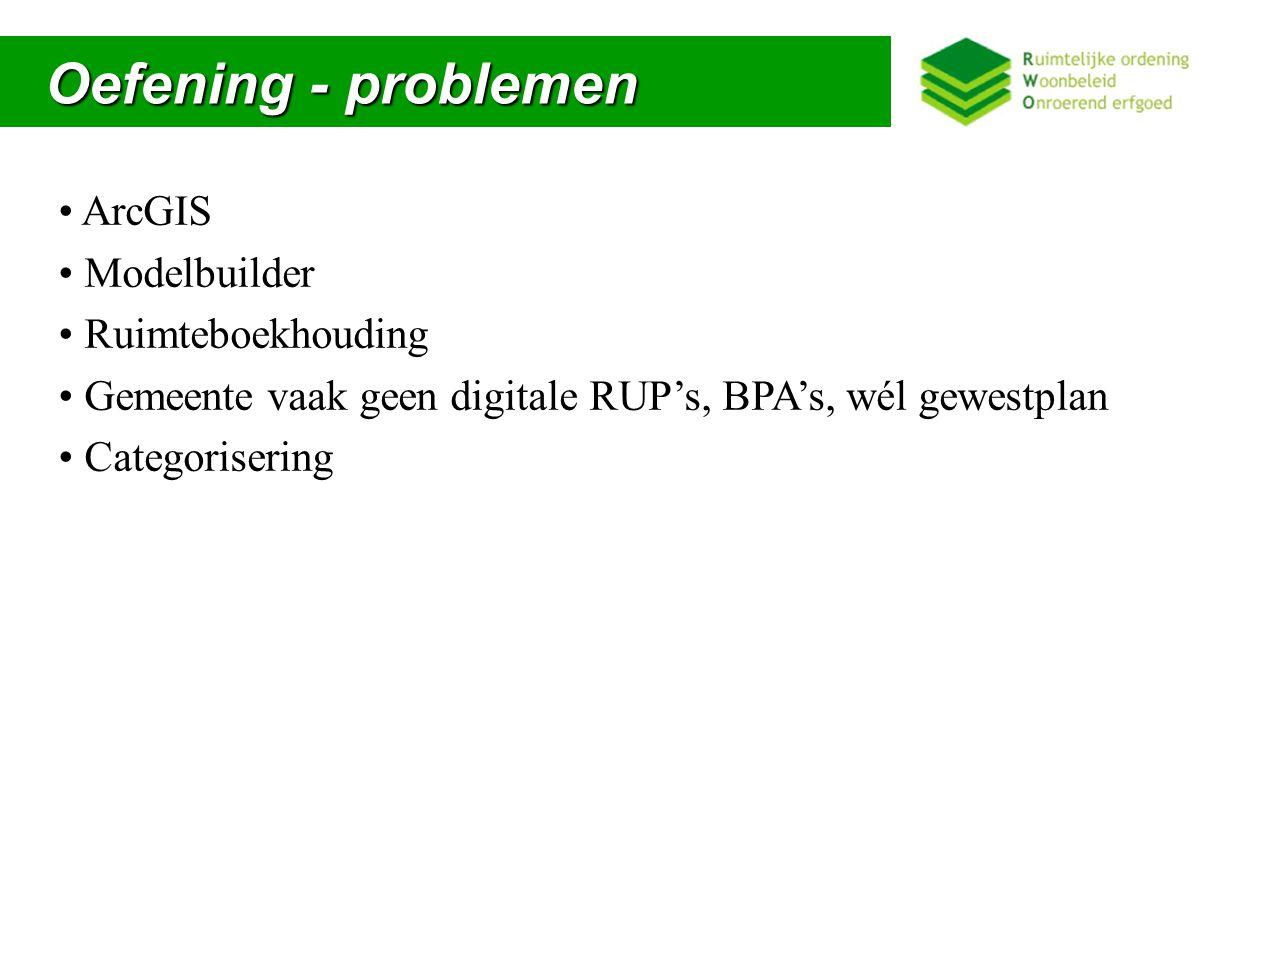 Oefening - problemen ArcGIS Modelbuilder Ruimteboekhouding